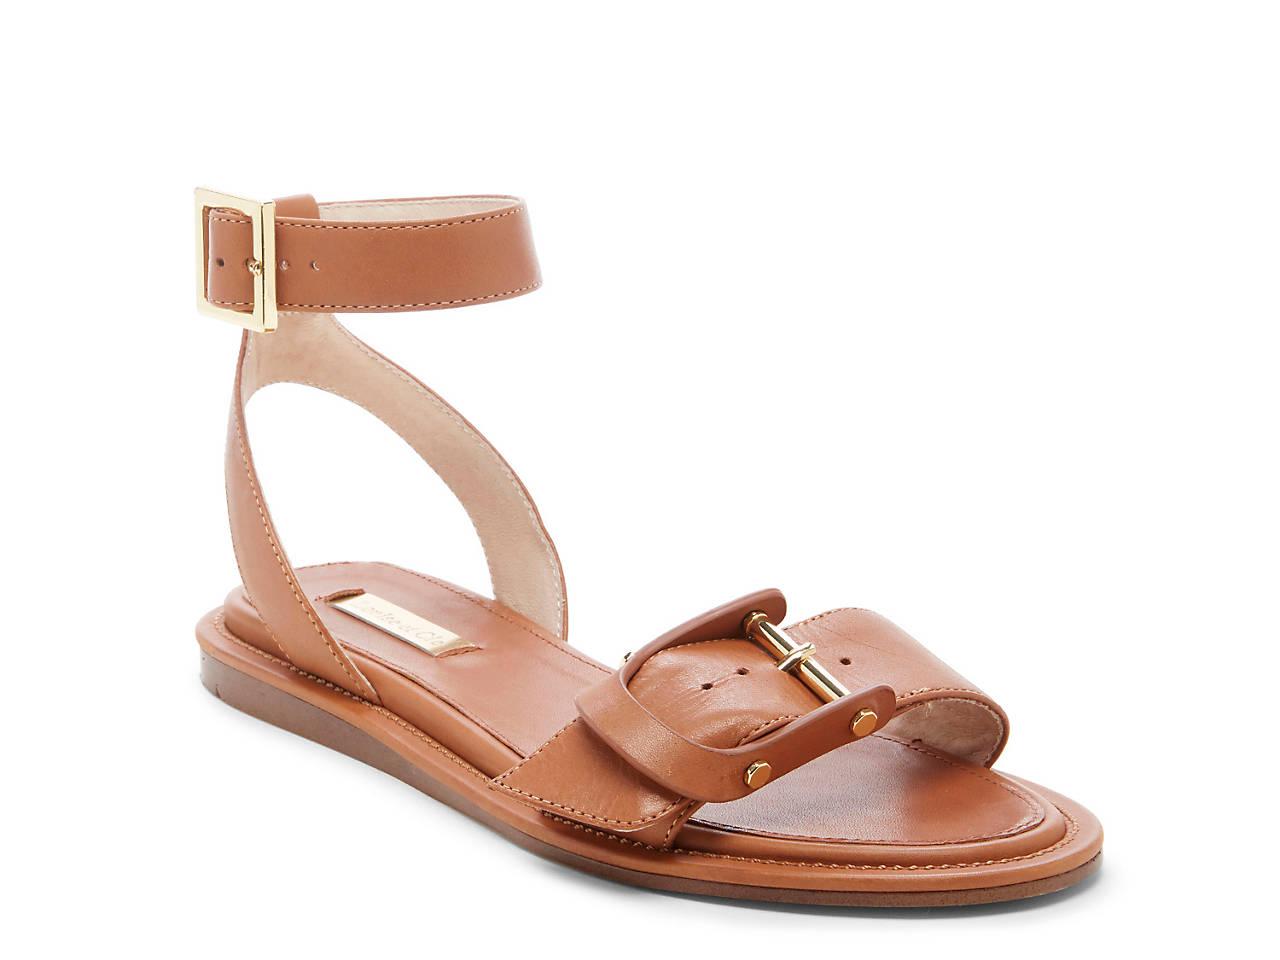 63ab4cd8667 Benue Sandal